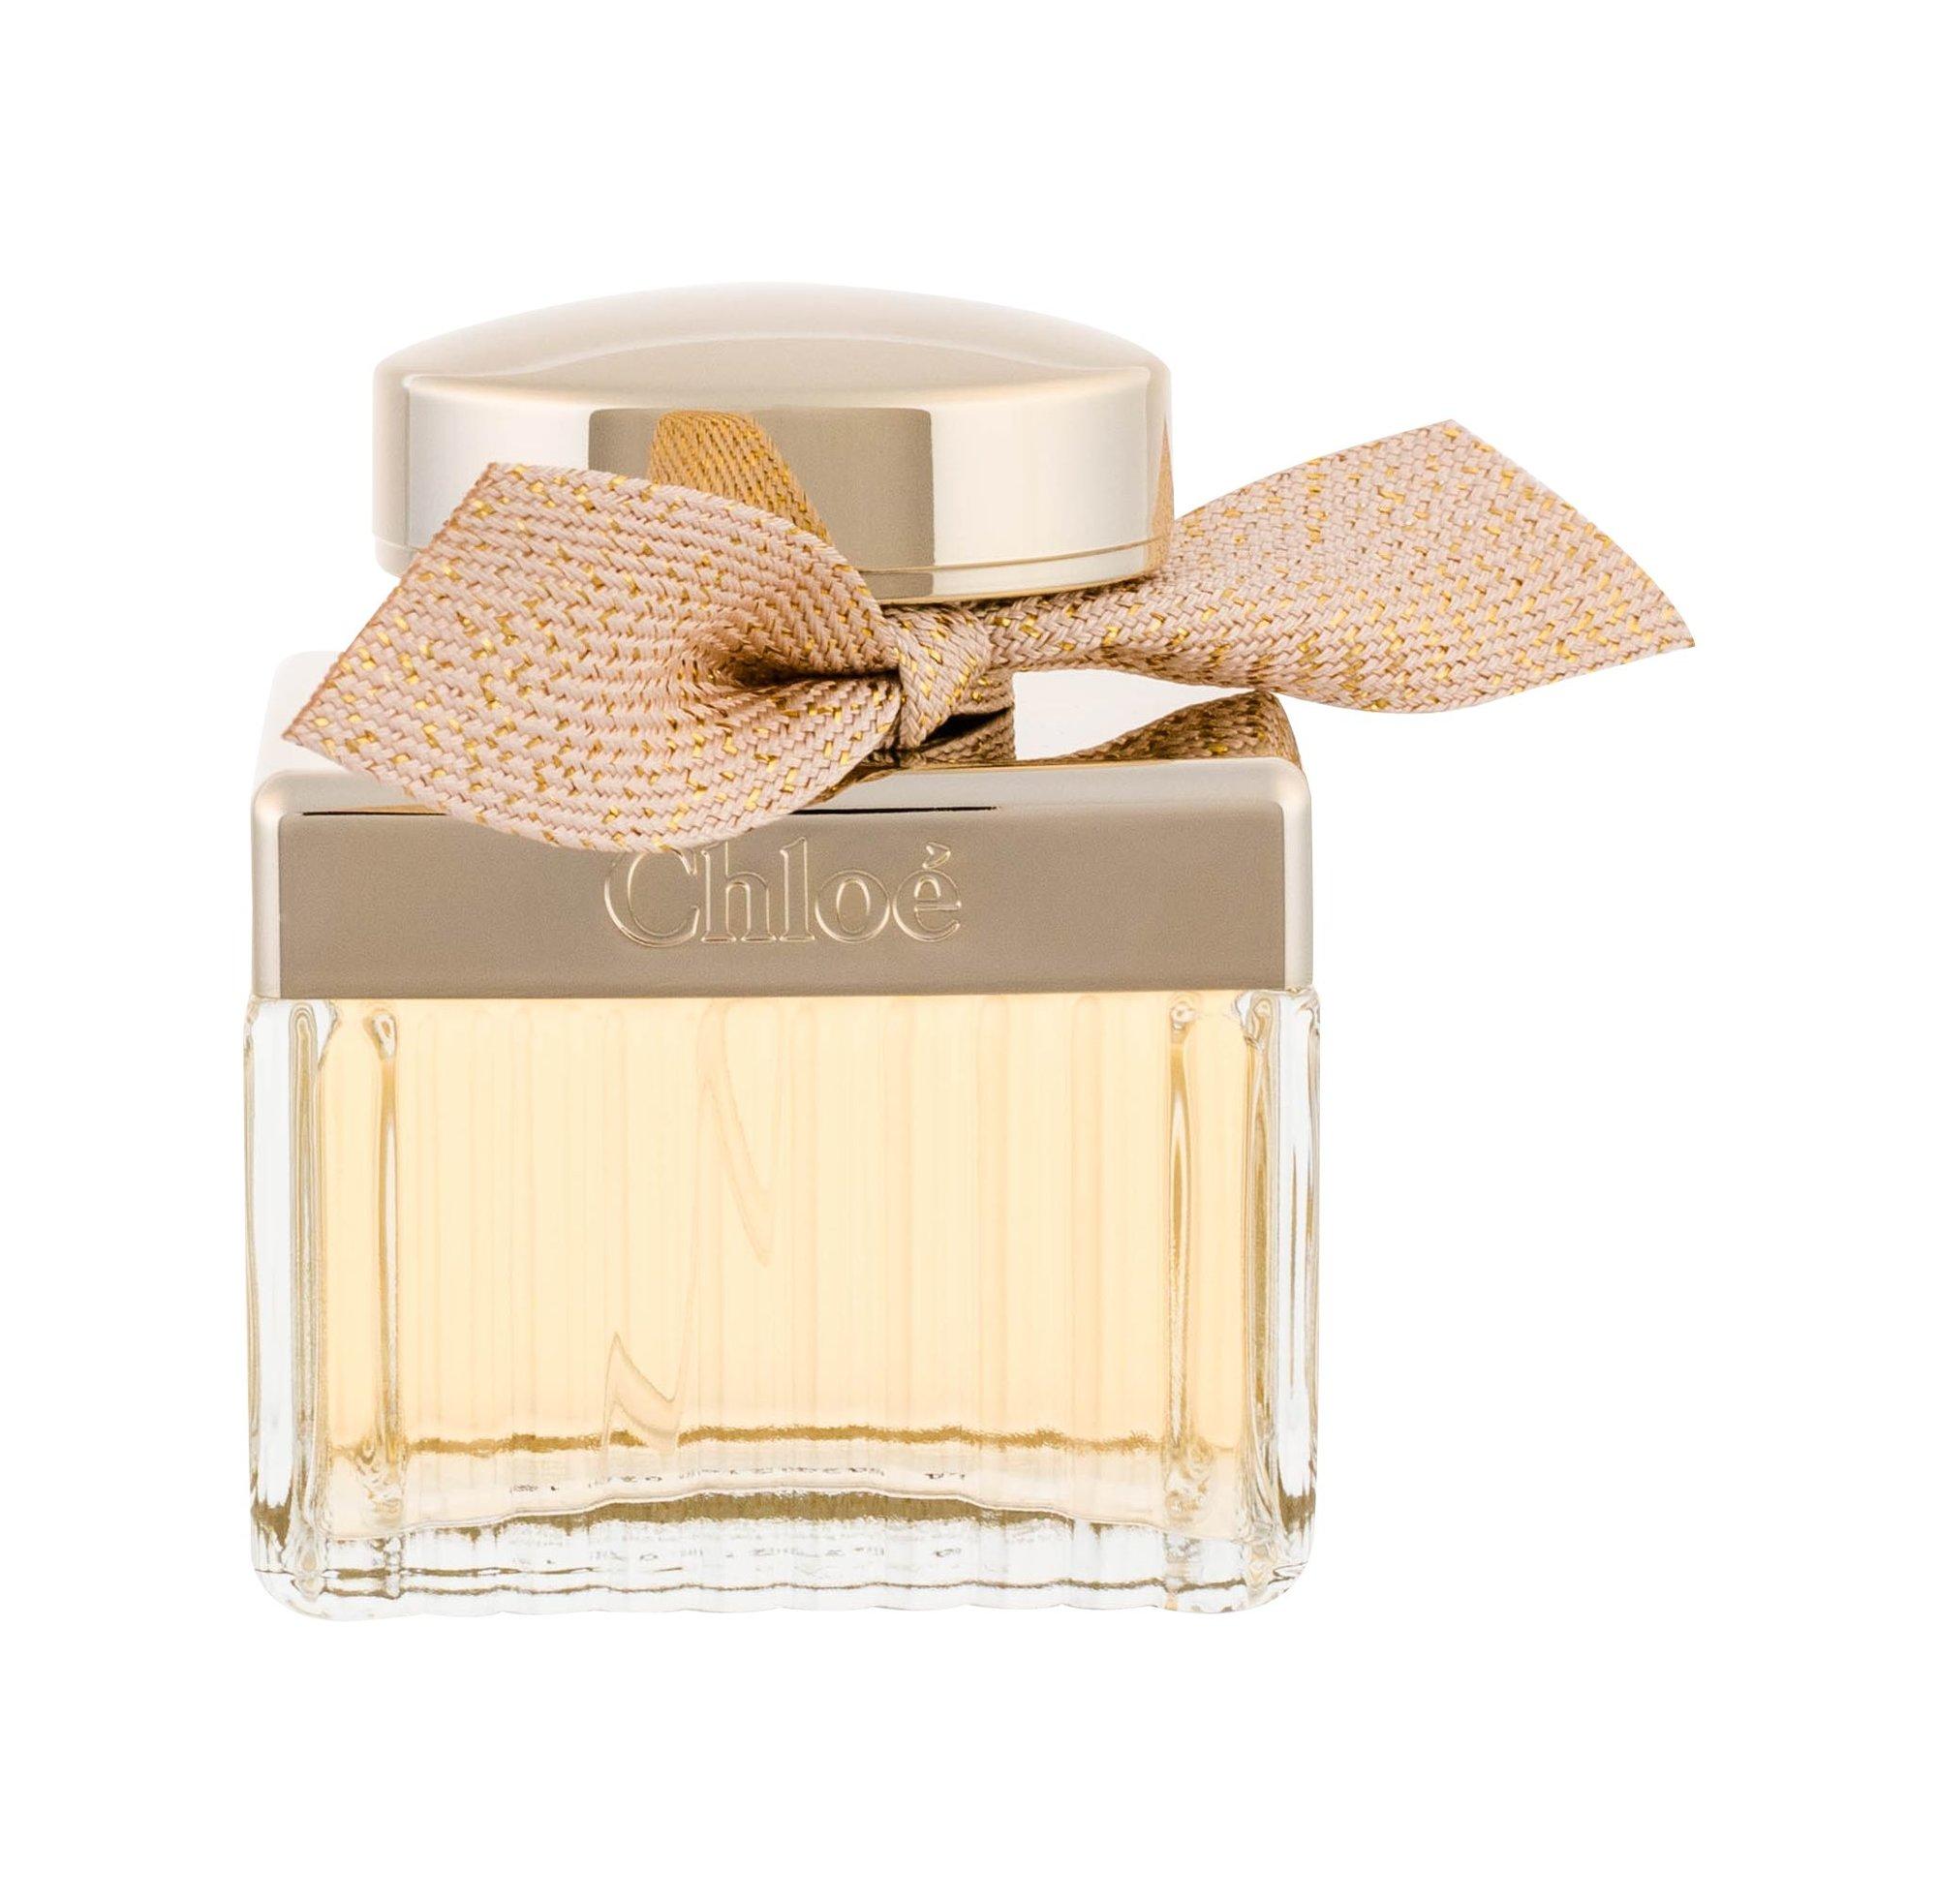 Chloe Chloe Eau de Parfum 50ml  Absolu